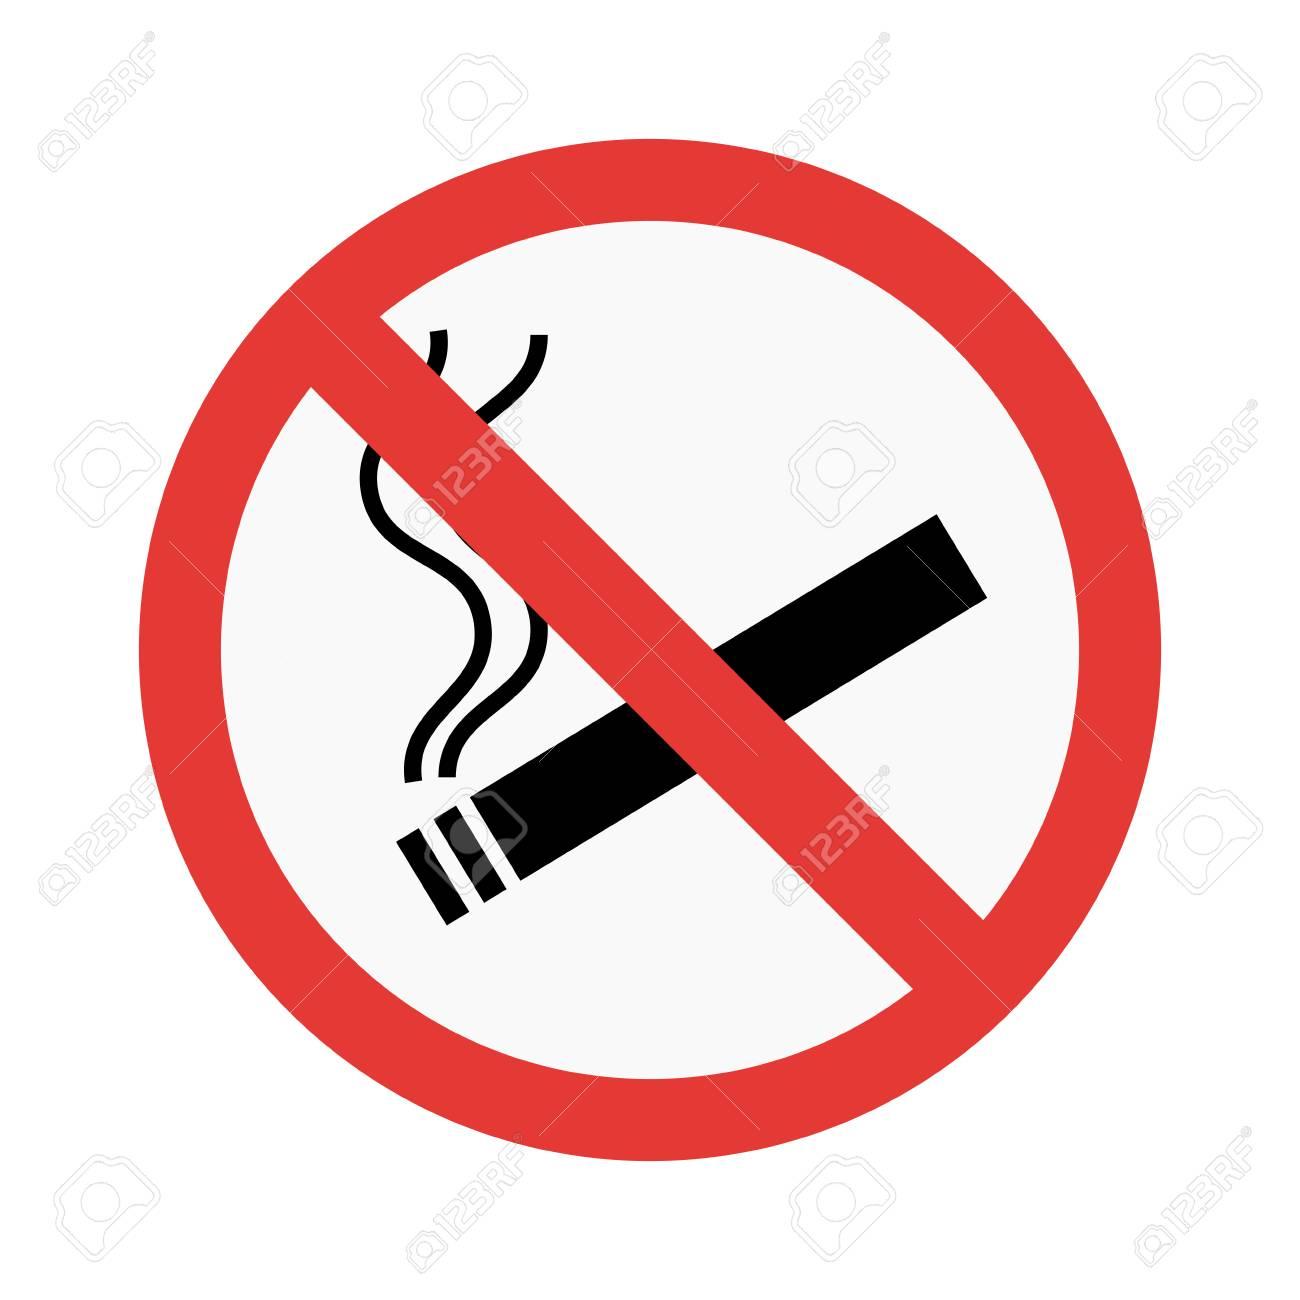 No smoke sign vector illustration - 59439423